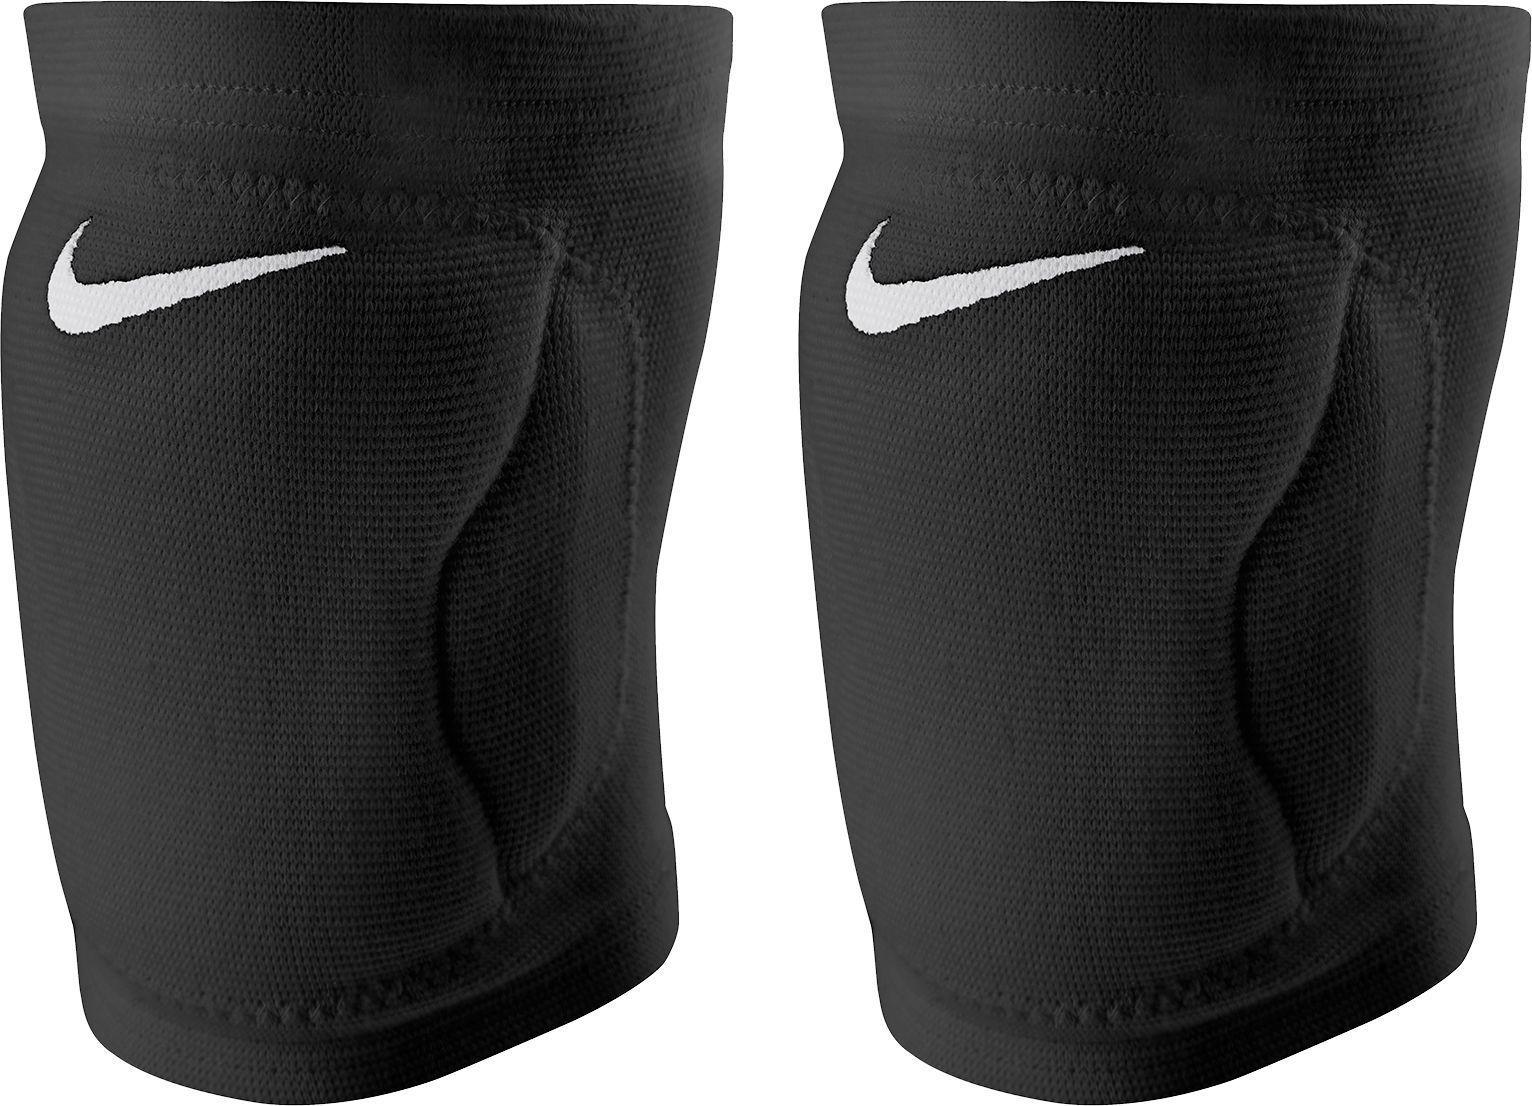 Nike Streak Volleyball Knee Pads Size Xss In 2020 Volleyball Outfits Volleyball Knee Pads Nike Volleyball